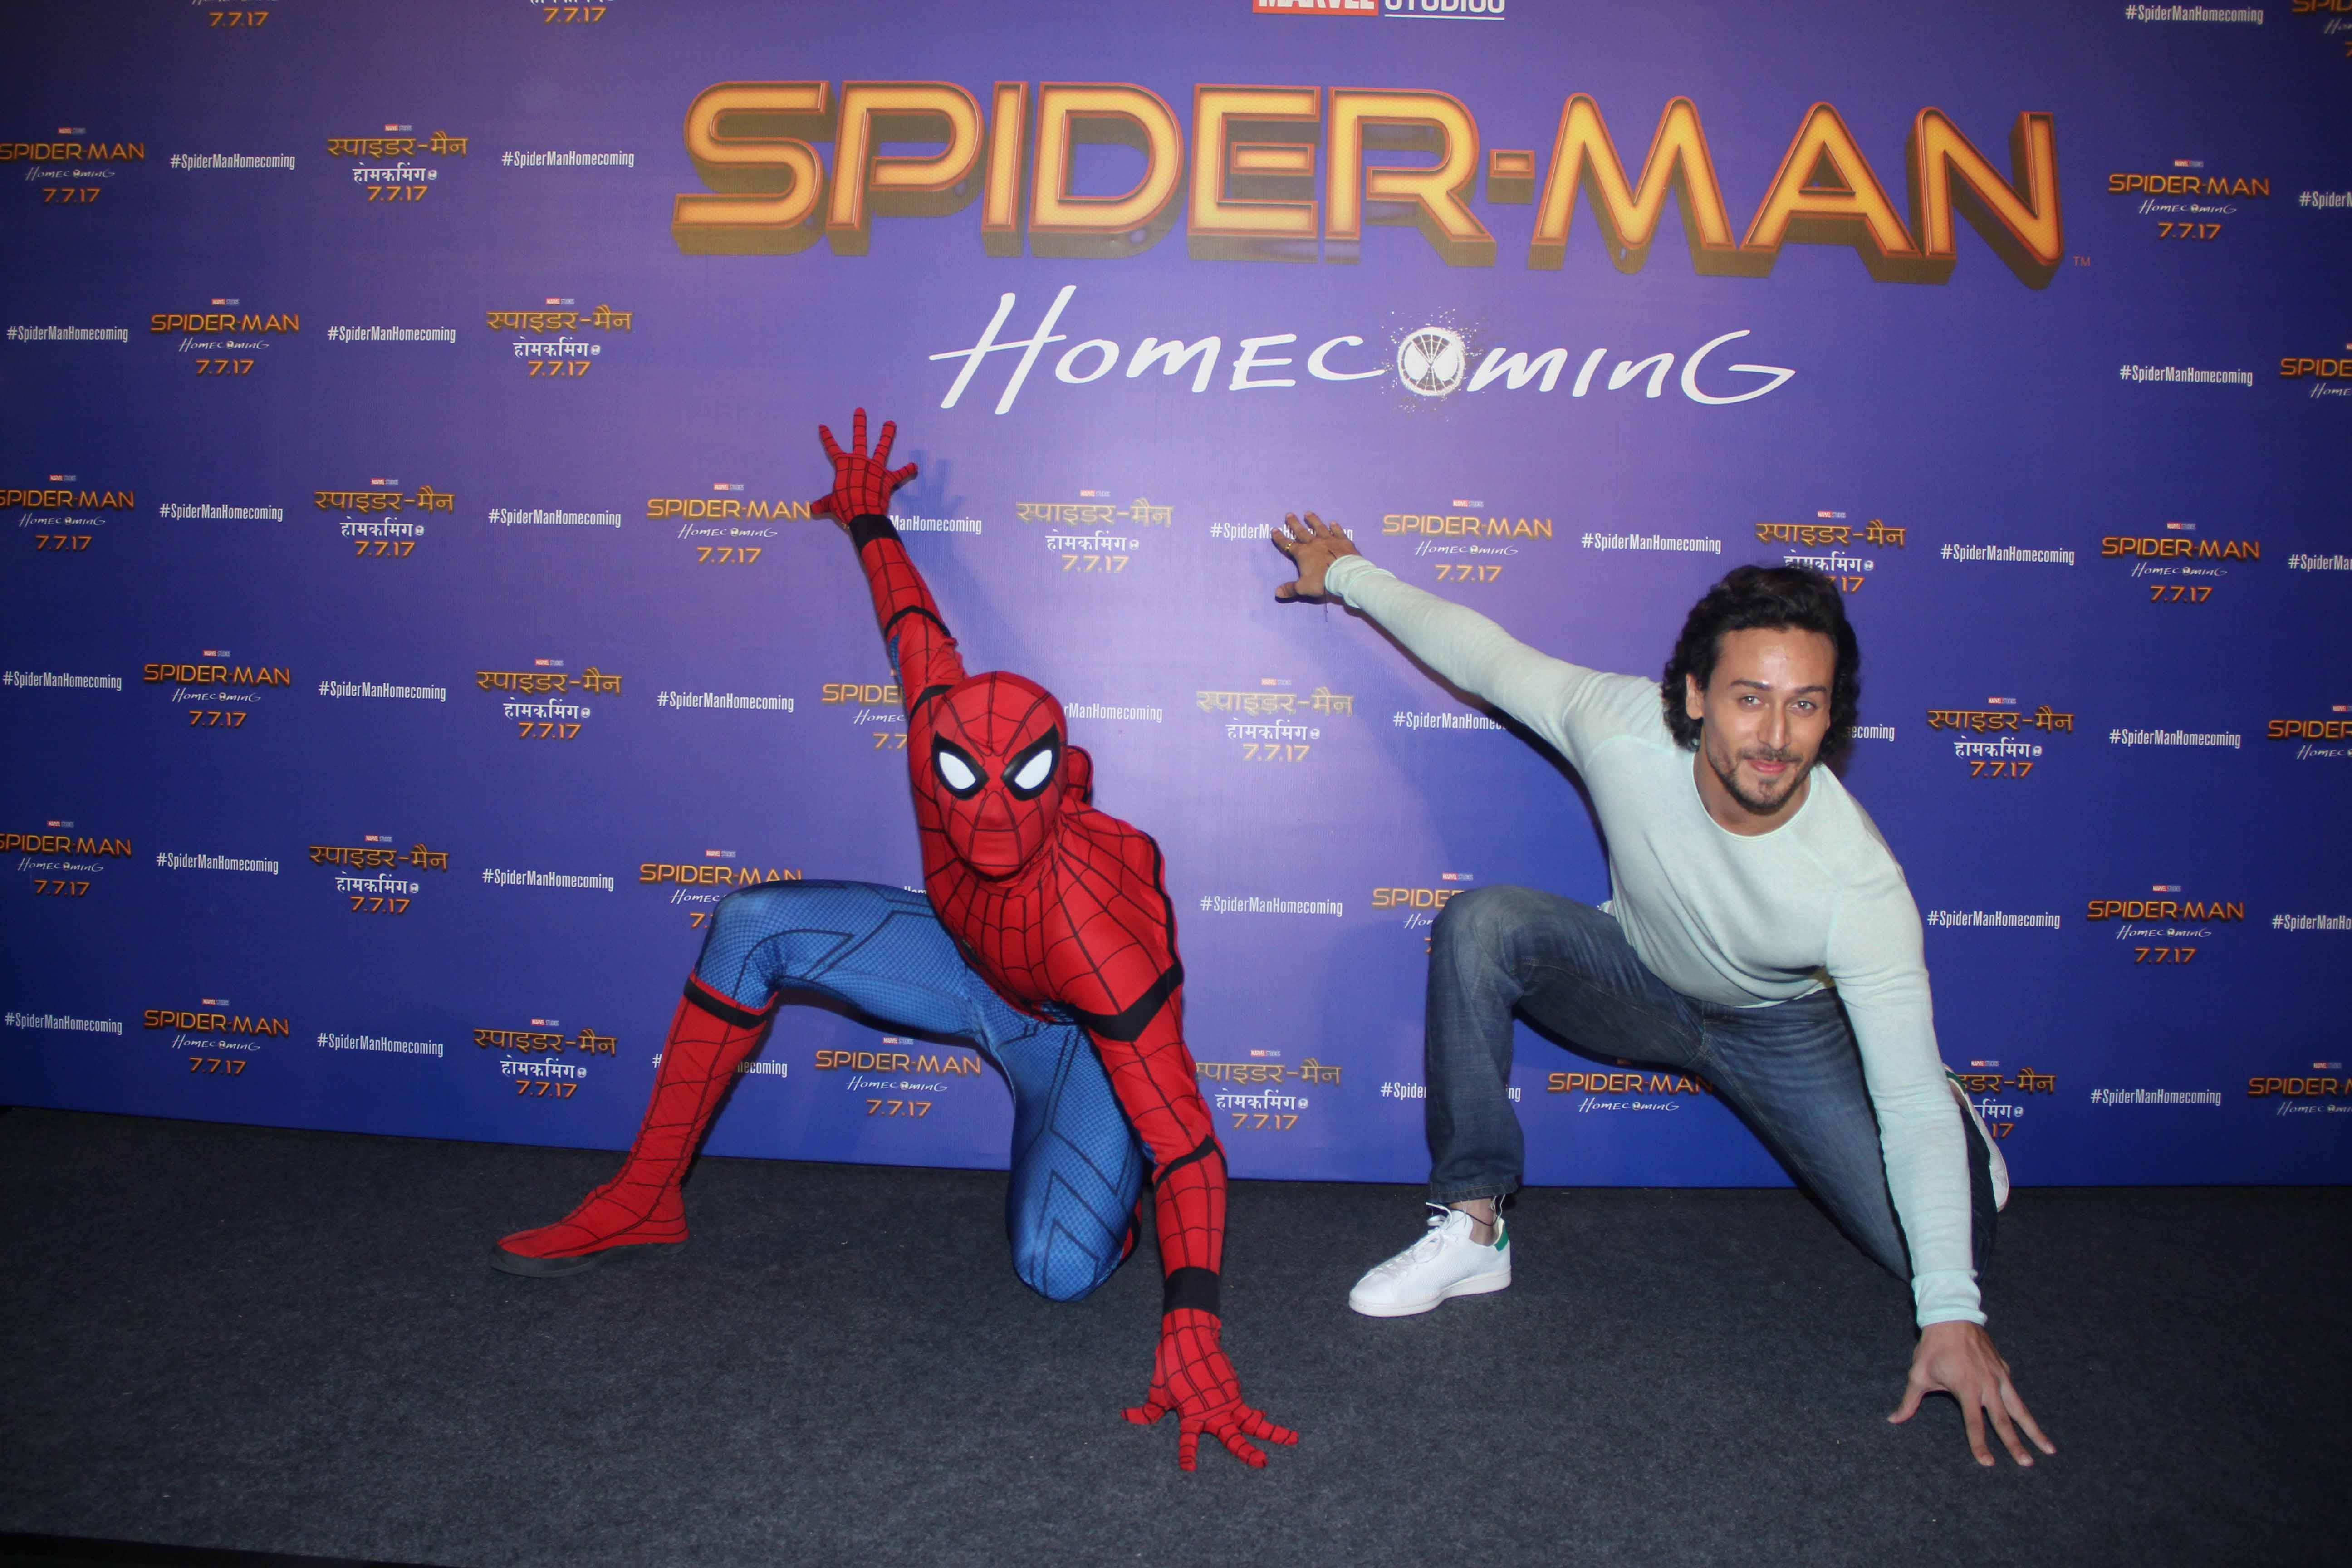 Tiger Shroff Launches Hindi Trailer of 'Spider-Man: Homecoming'